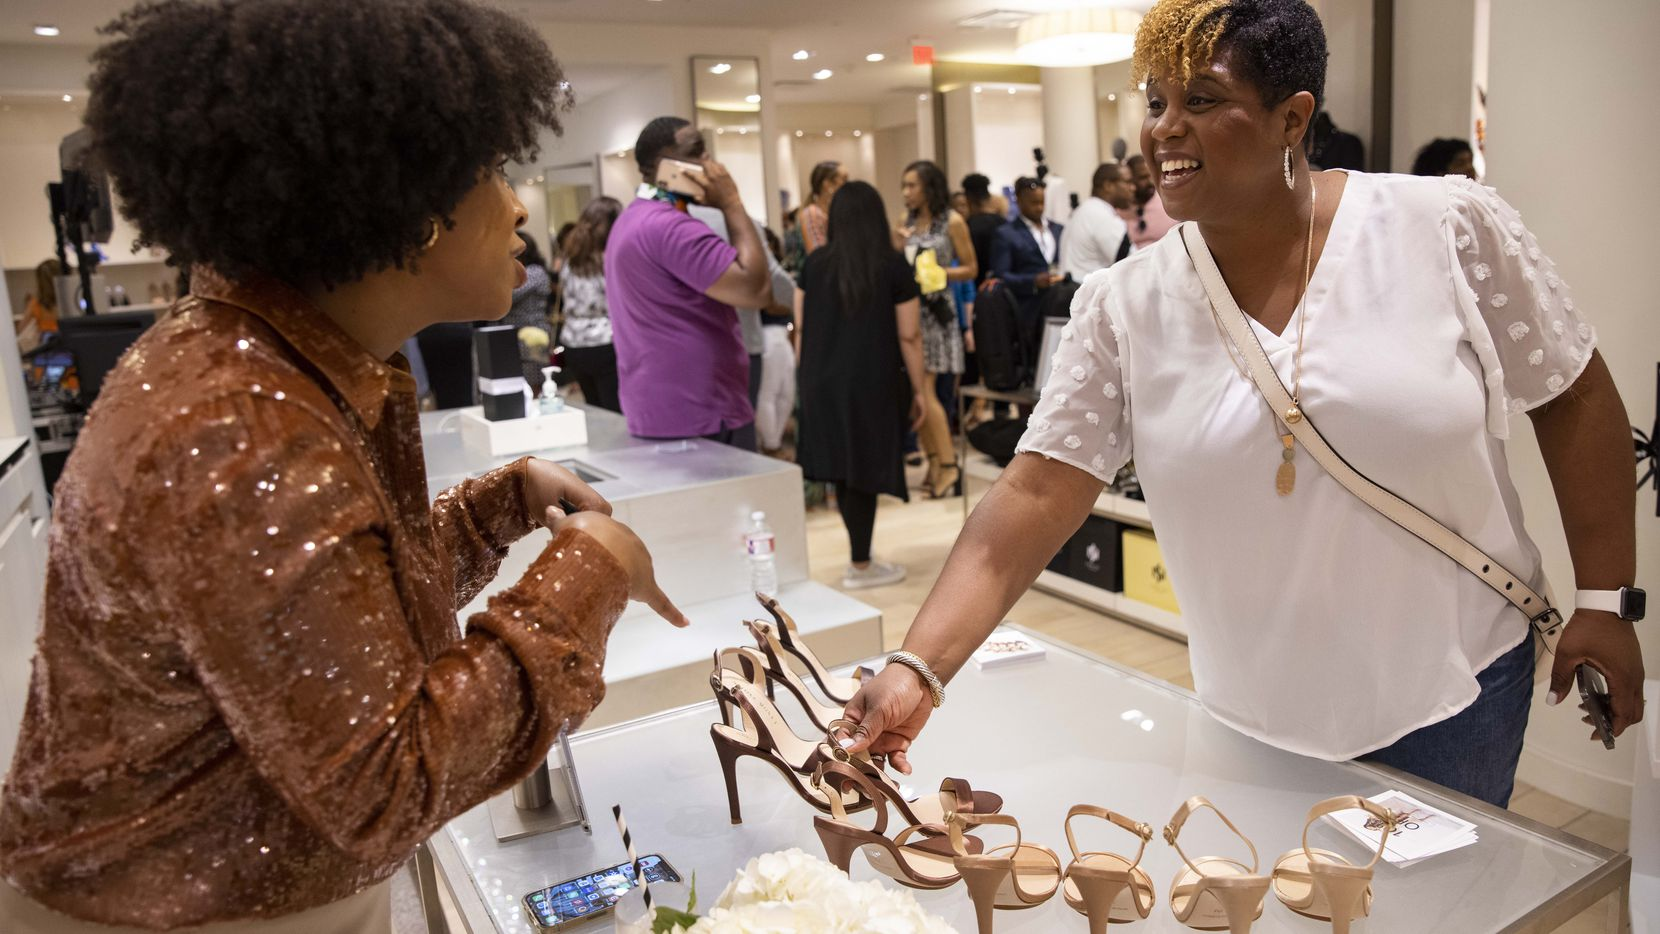 Designer Salone Monet, left, talks to customer Judy Garner at the Black Fashion Movement pop-up store on Wednesday.